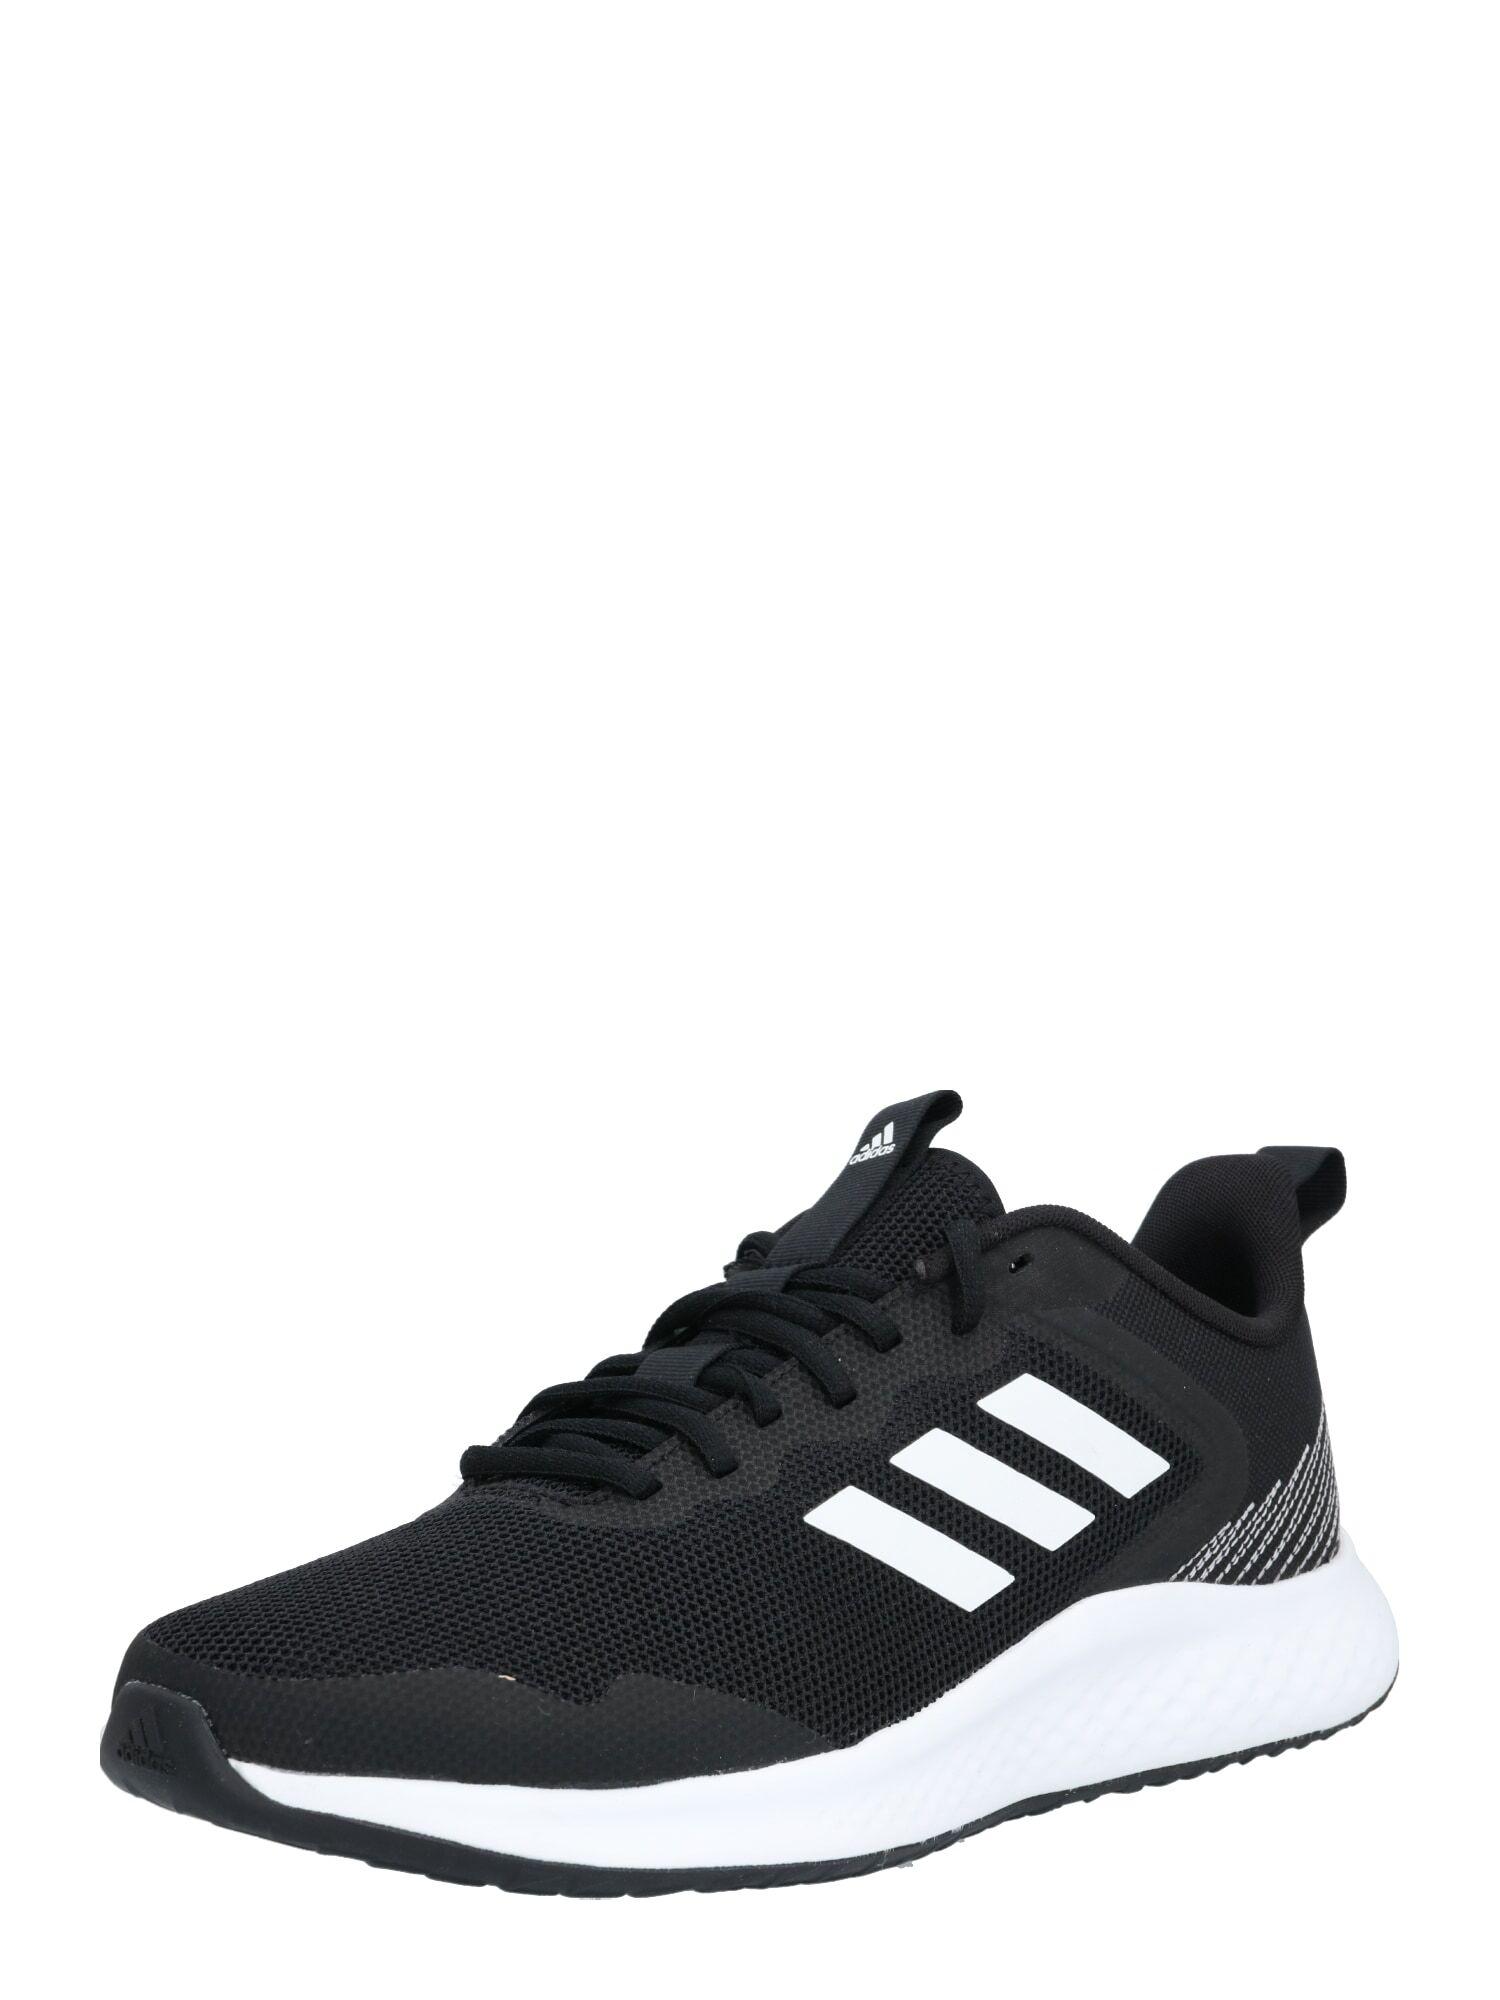 ADIDAS PERFORMANCE Chaussure de course 'Fluid Street'  - Noir - Taille: 8.5 - male